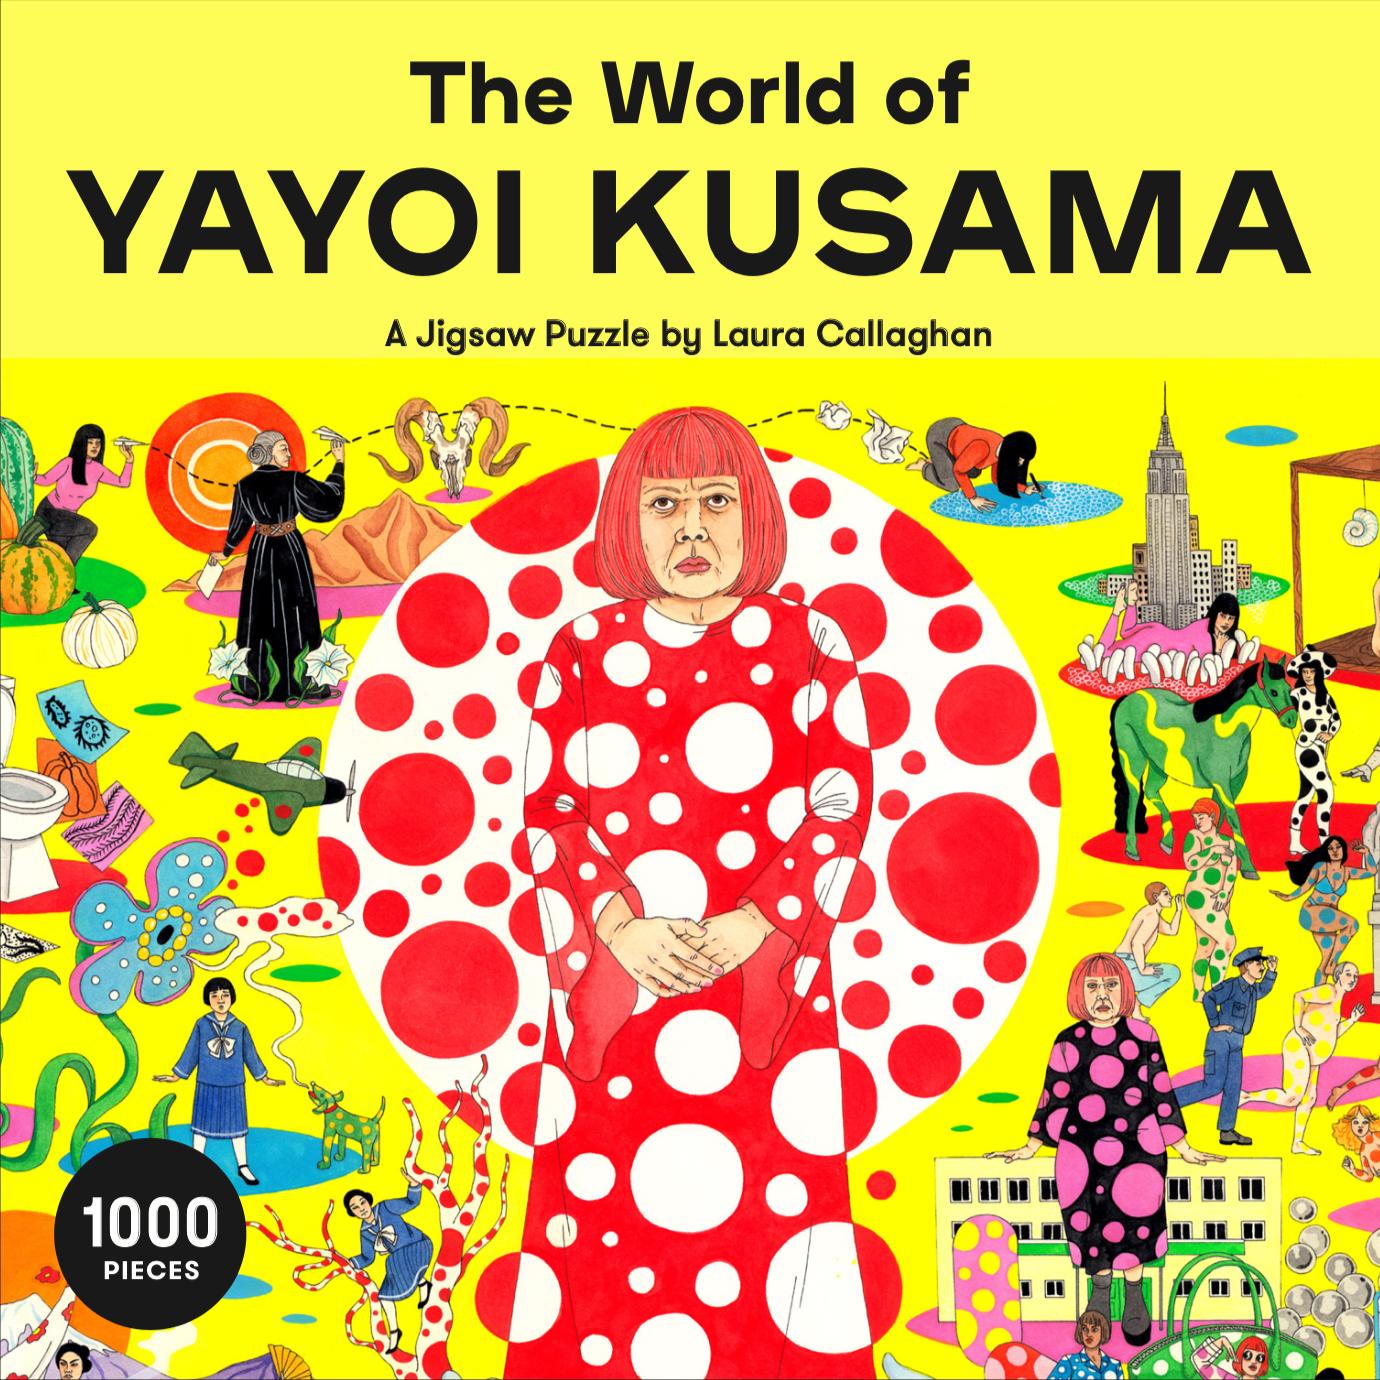 The World of Yayoi Kusama - Product Thumbnail